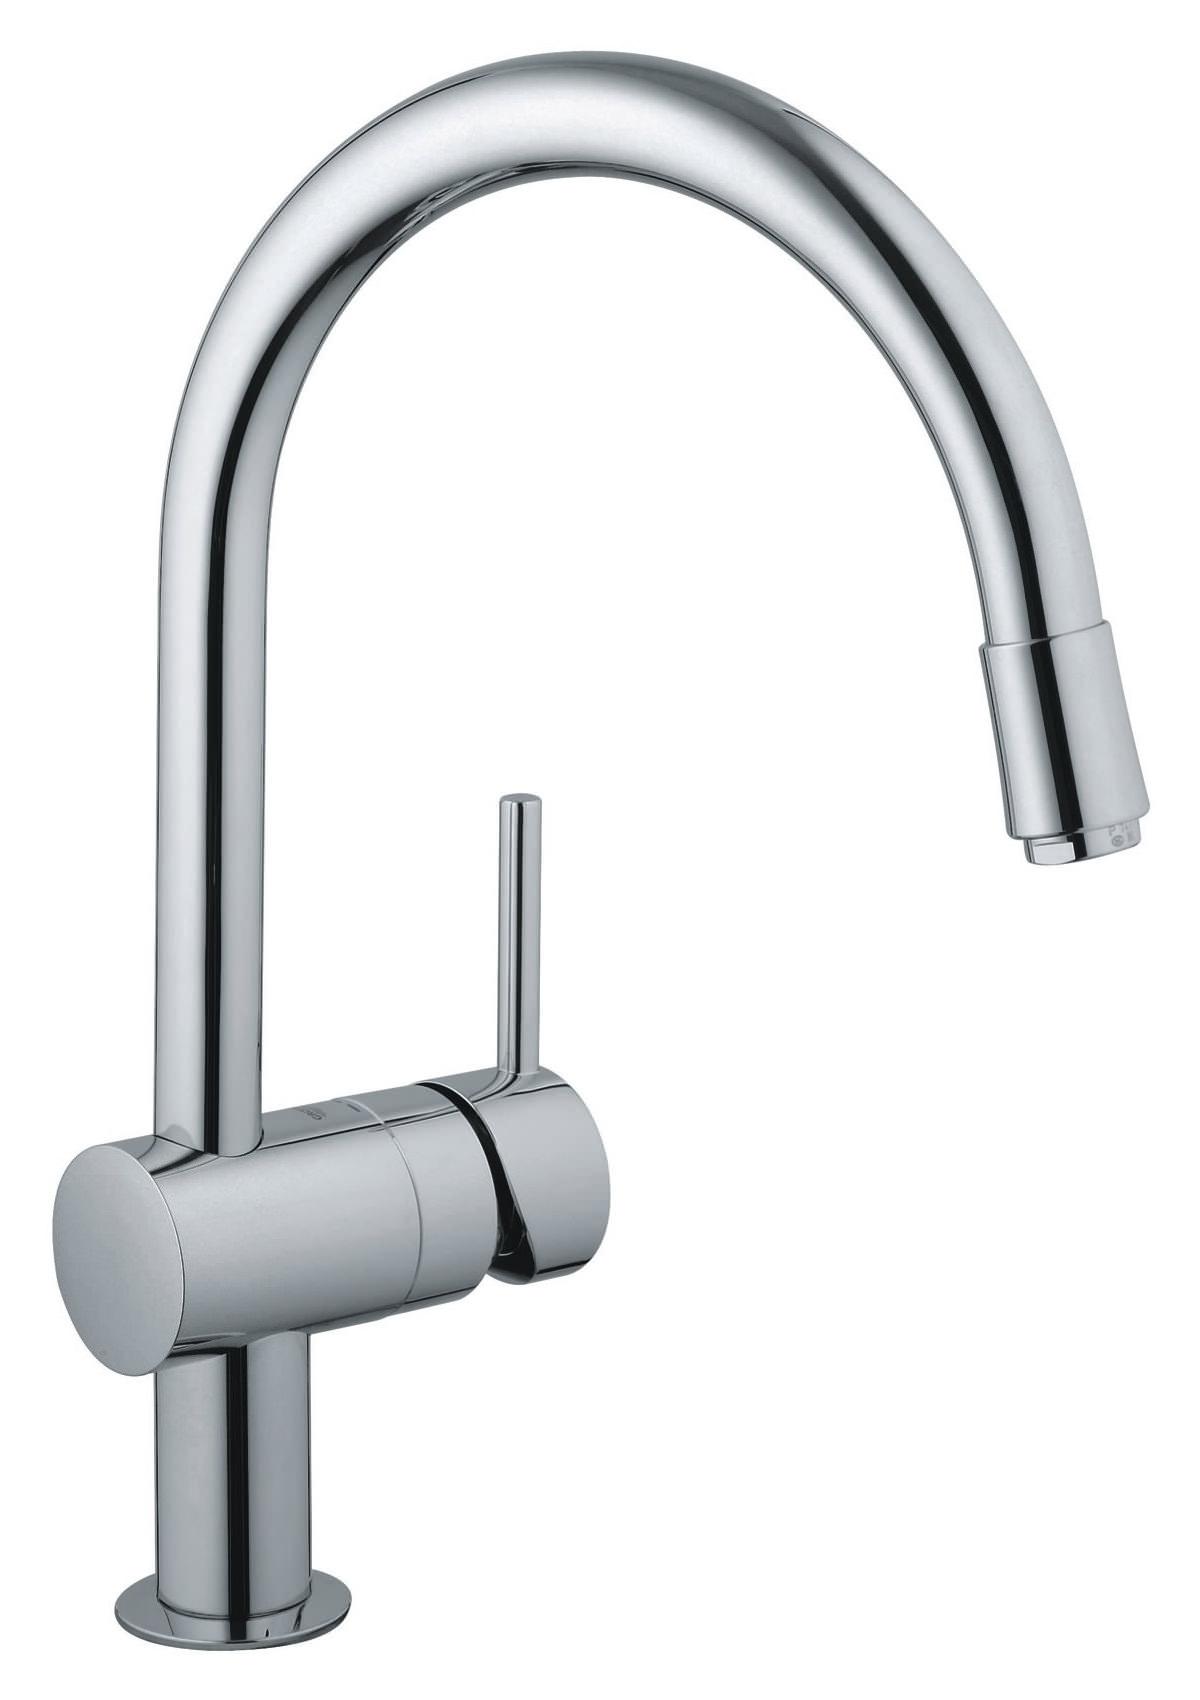 Grohe Minta Chrome Sink Mixer Tap With Mousseur Spout